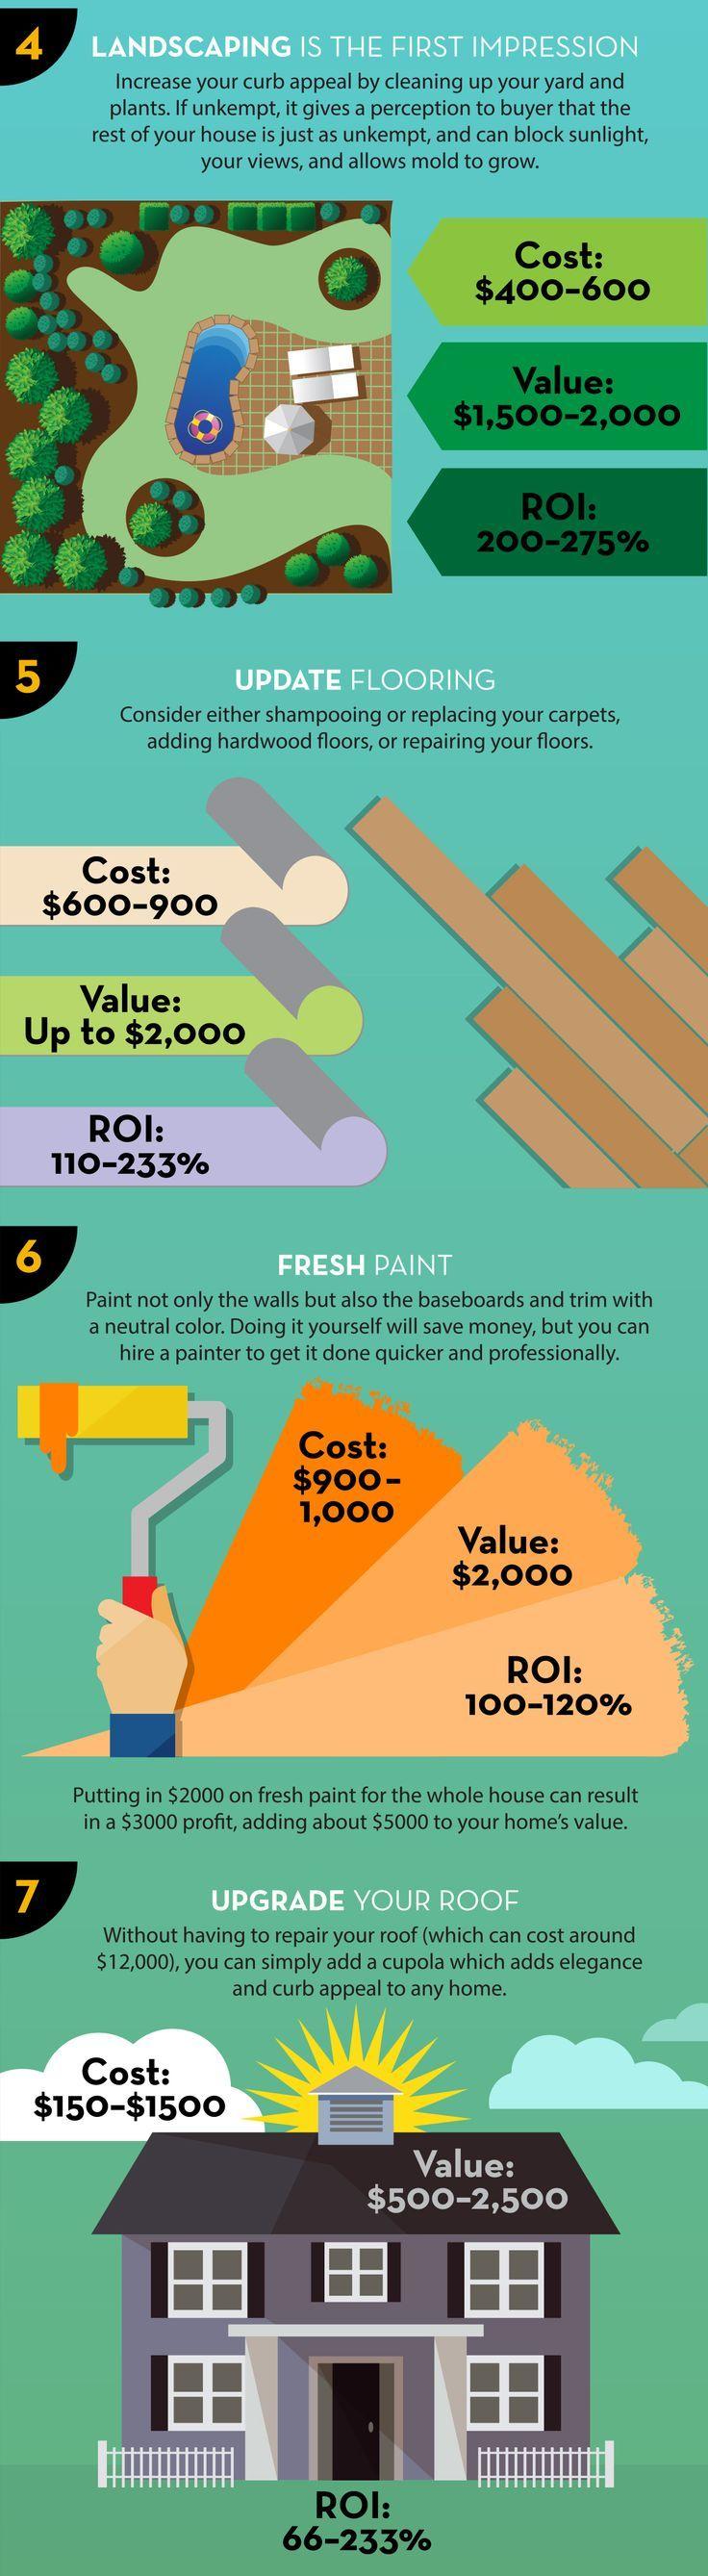 207 best Real Estate Investing images on Pinterest | Real estate ...